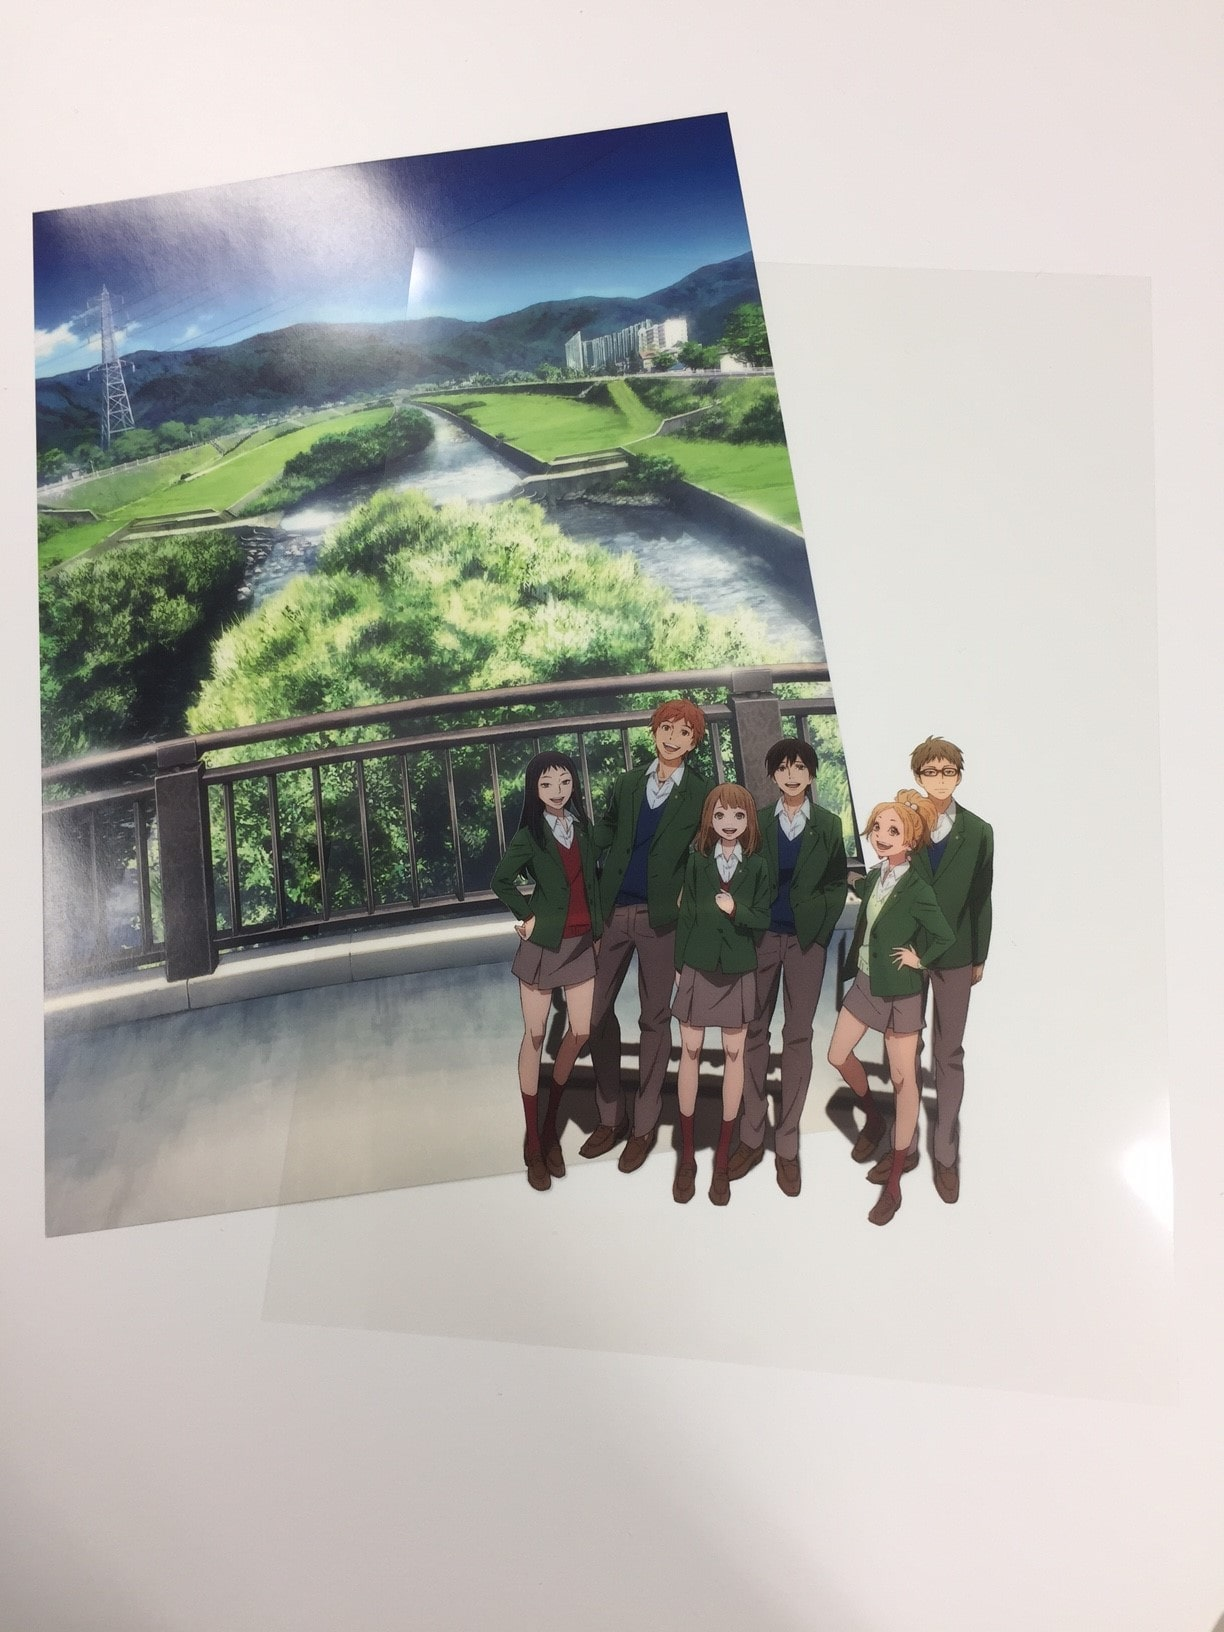 TVアニメ「orange」Vol.4 DVD 初回生産限定版